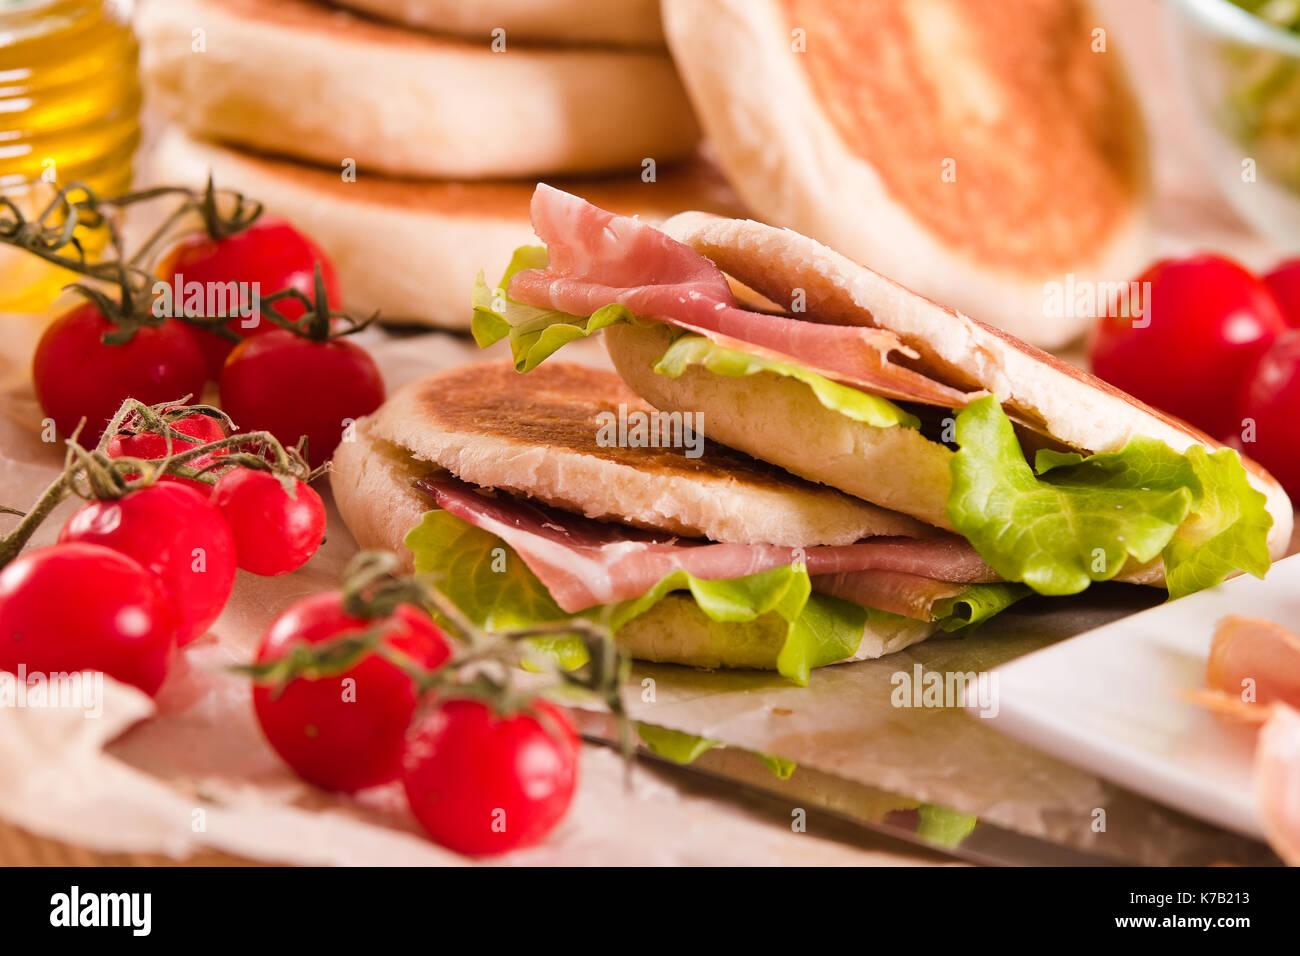 Tigella bread stuffed with ham and lettuce. - Stock Image